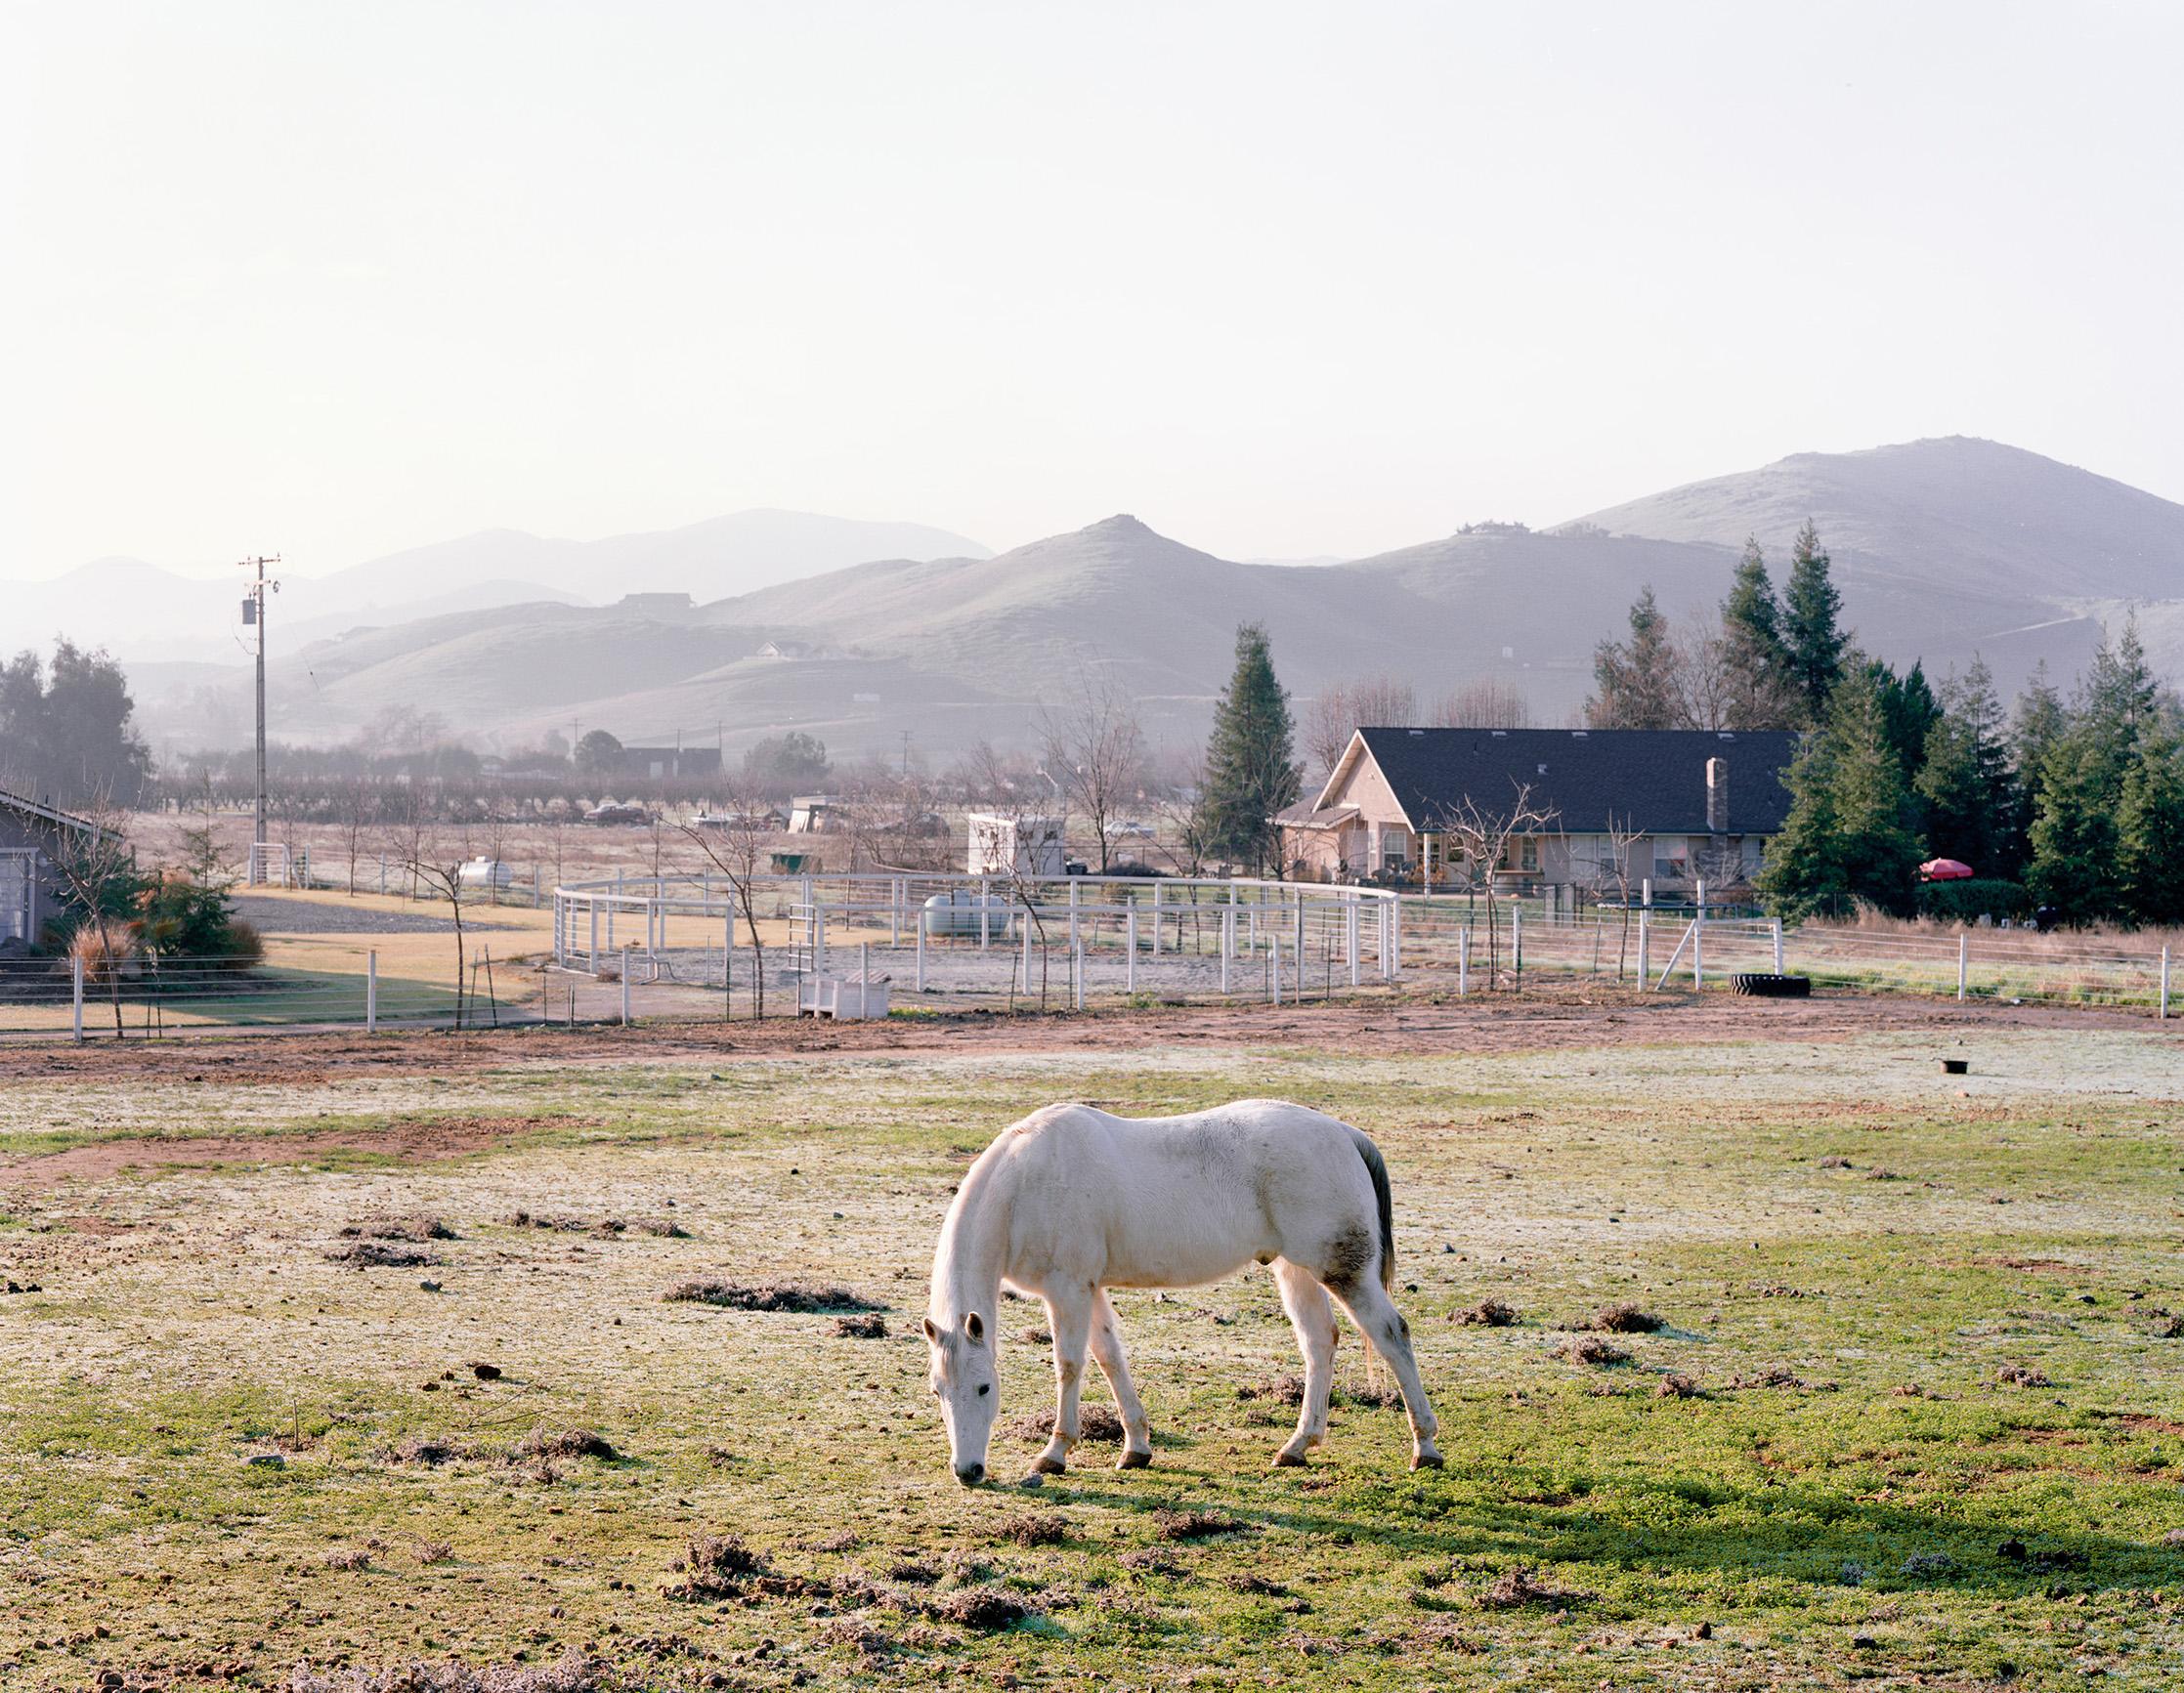 Near Bakersfield, California